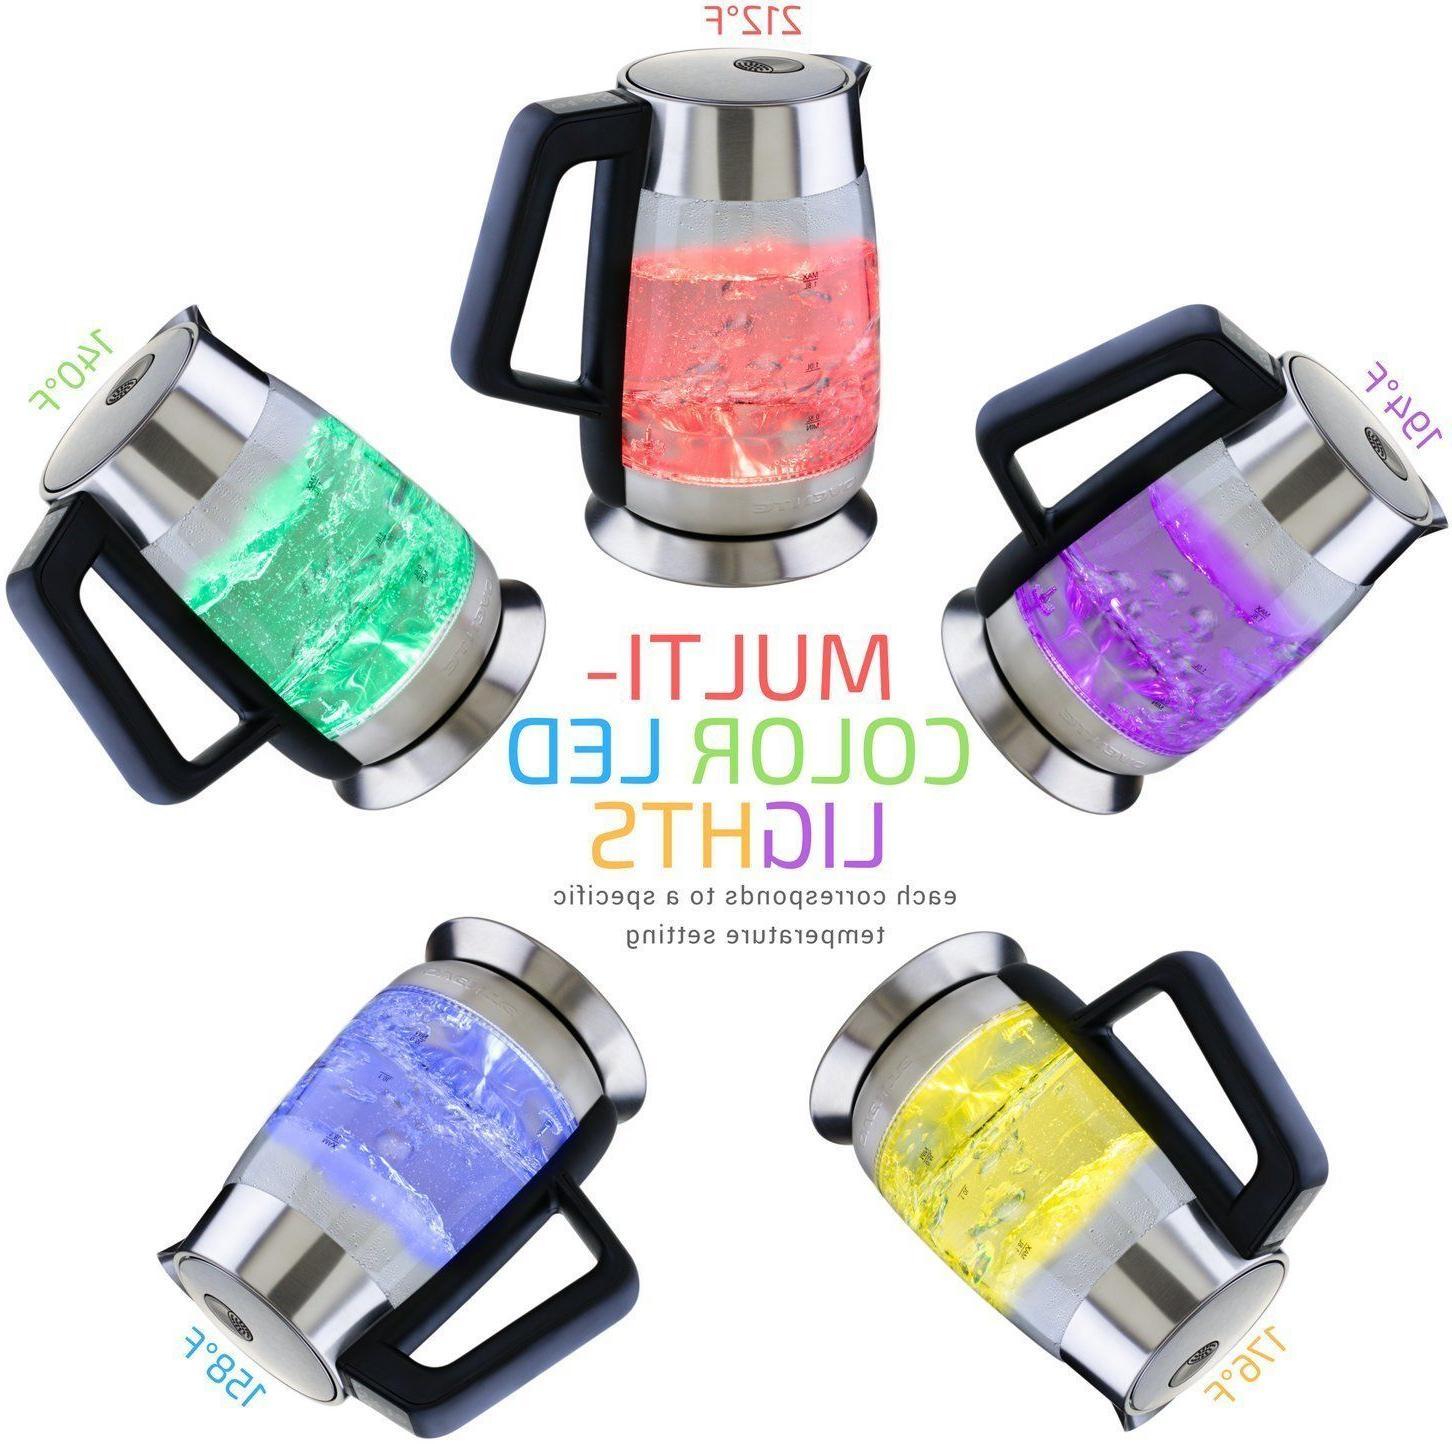 Ovente 1.8L Electric Tea Kettle Temperature BPA